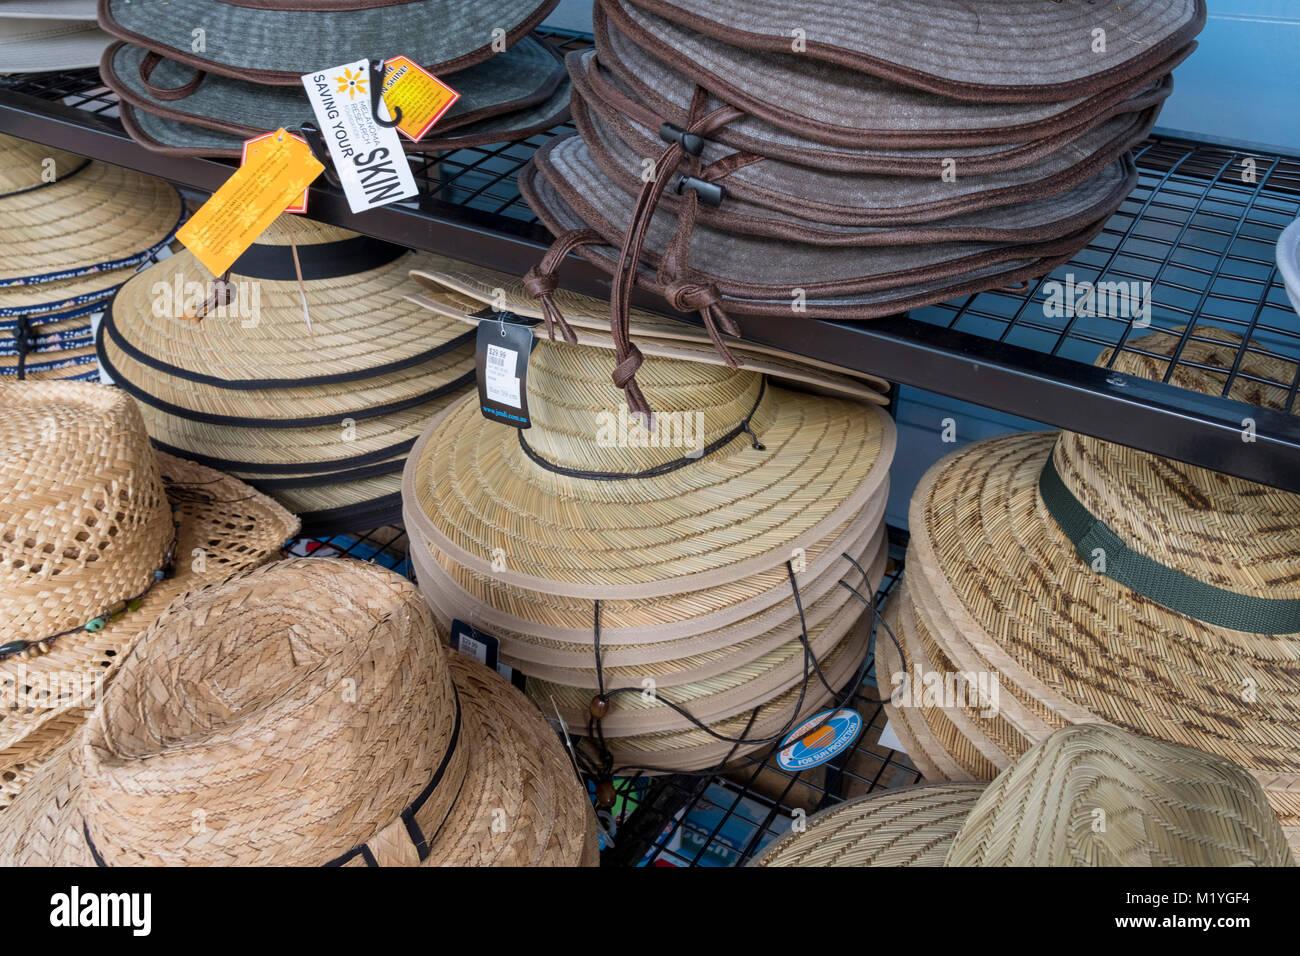 d449e83297 Australian mens hats on sale at a shop in Port Douglas,Australia - Stock  Image